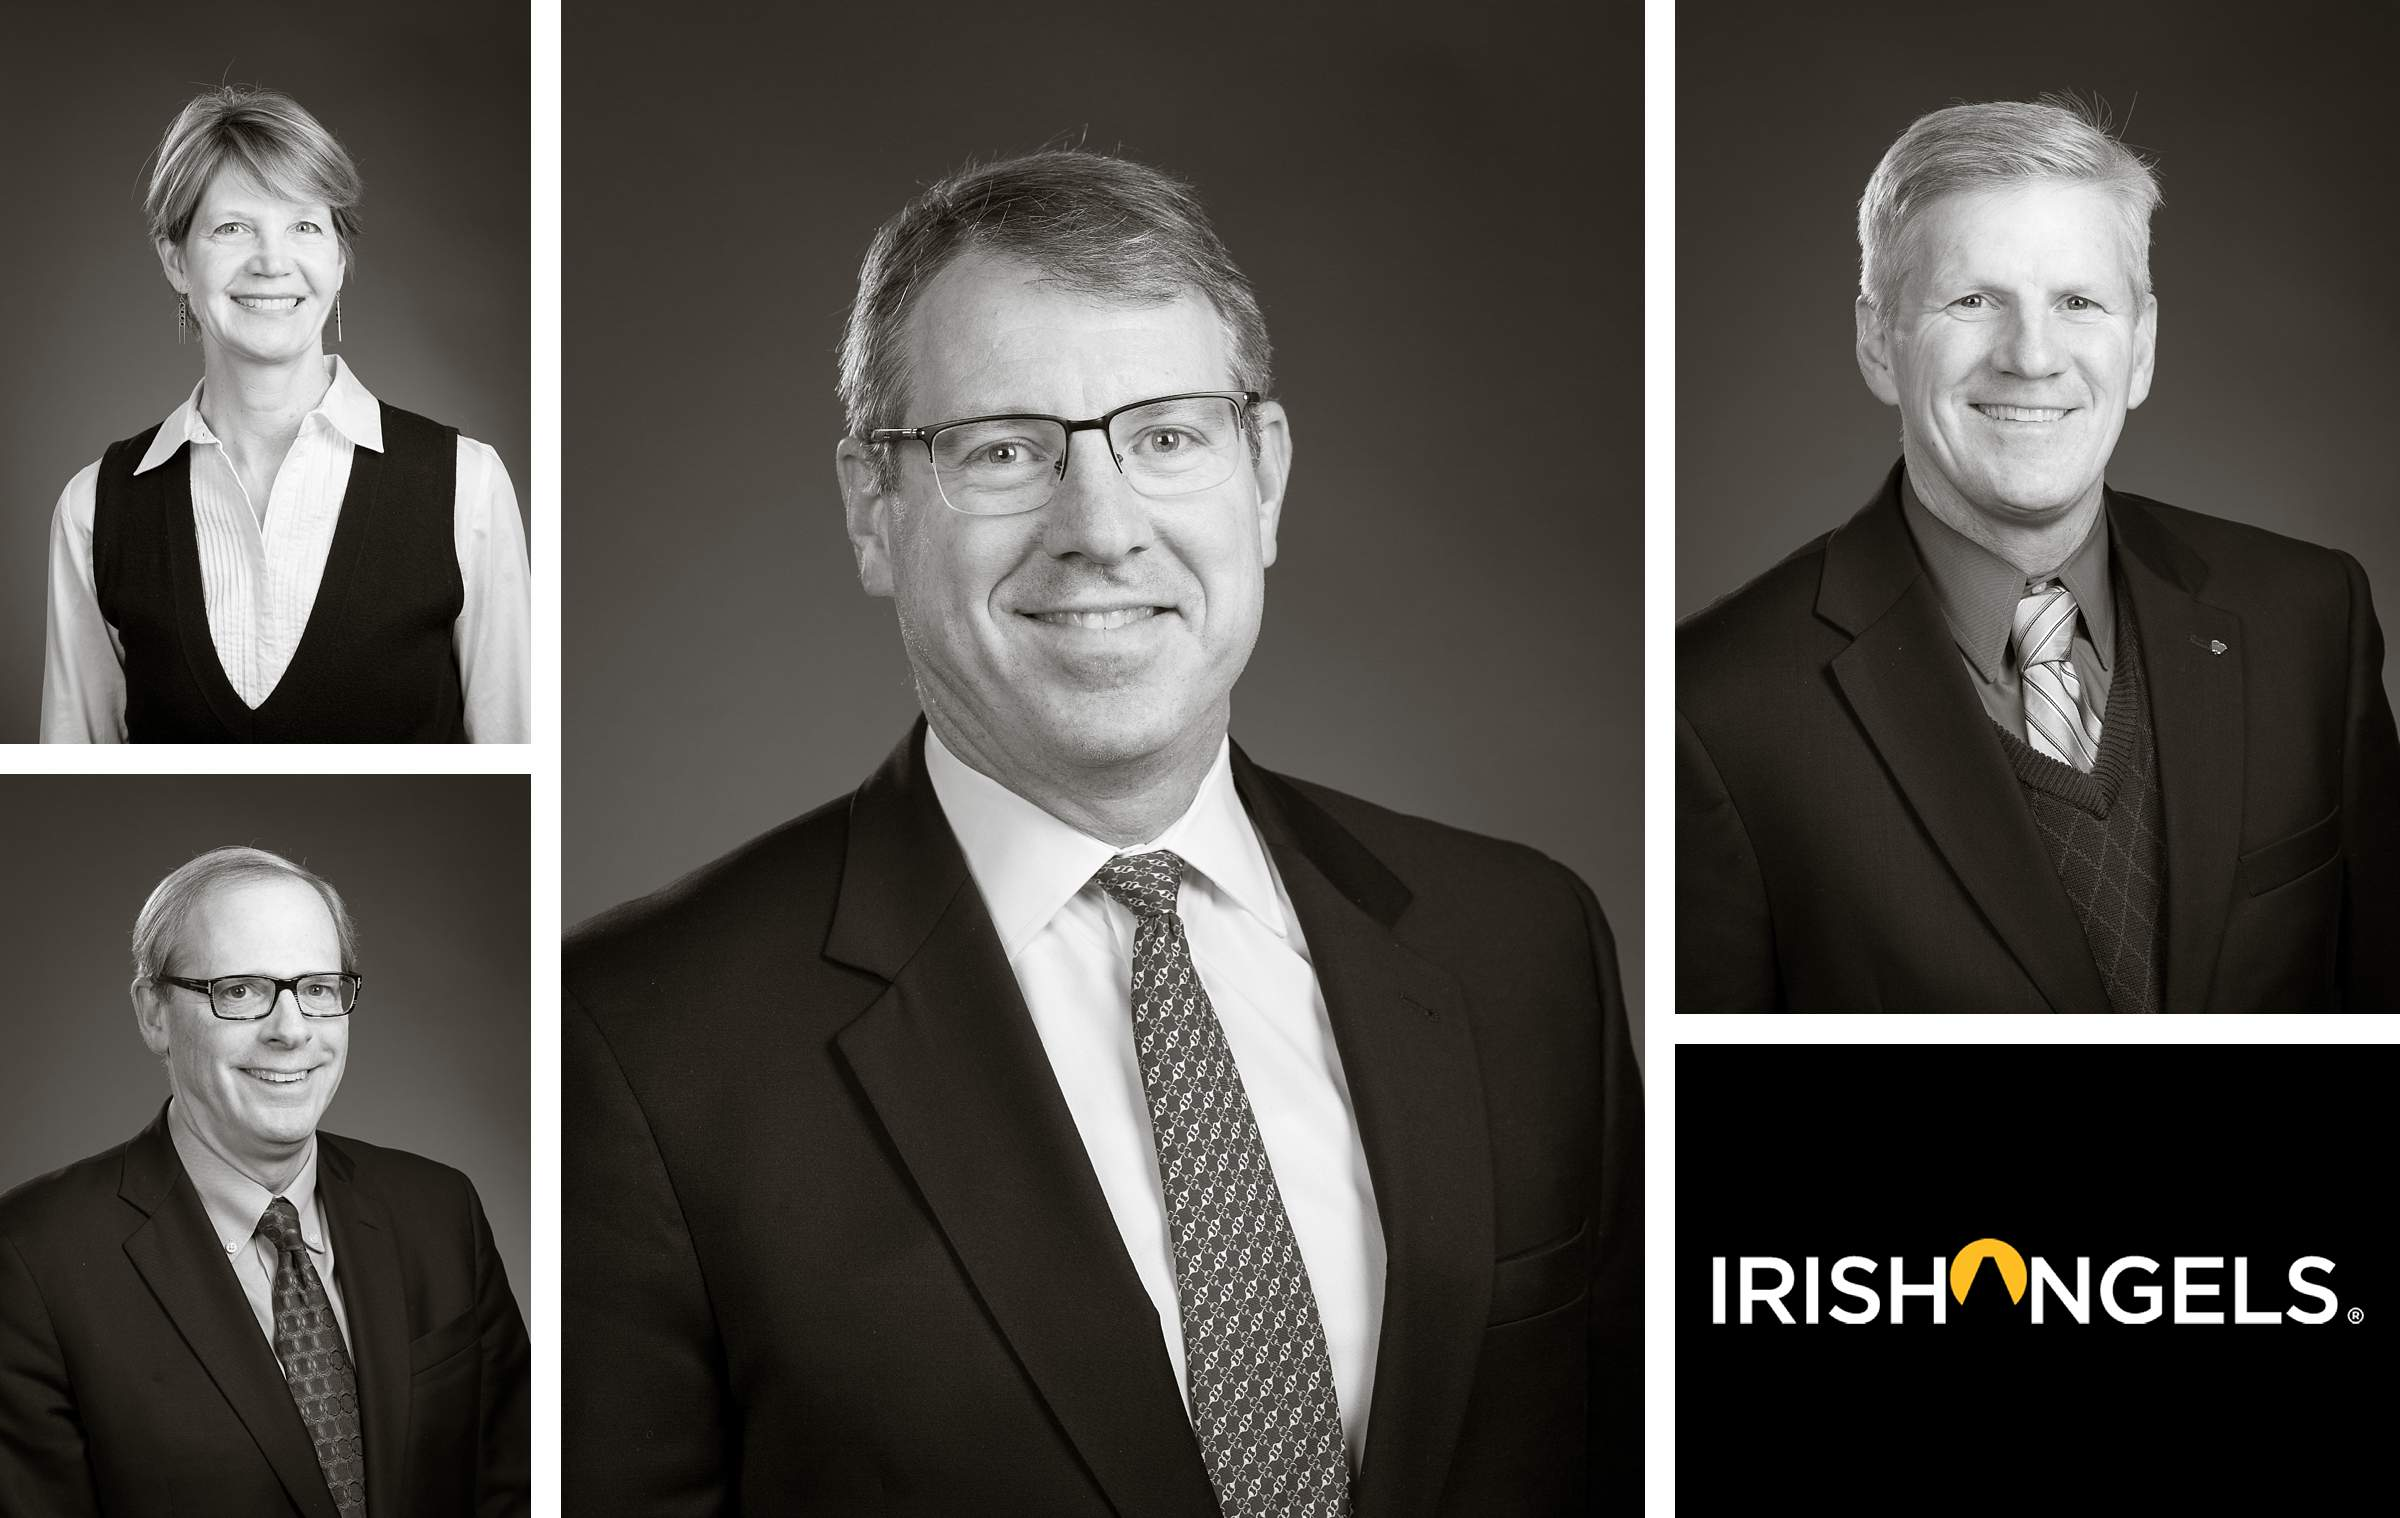 Black and white business headshot portrait for linkedin profile